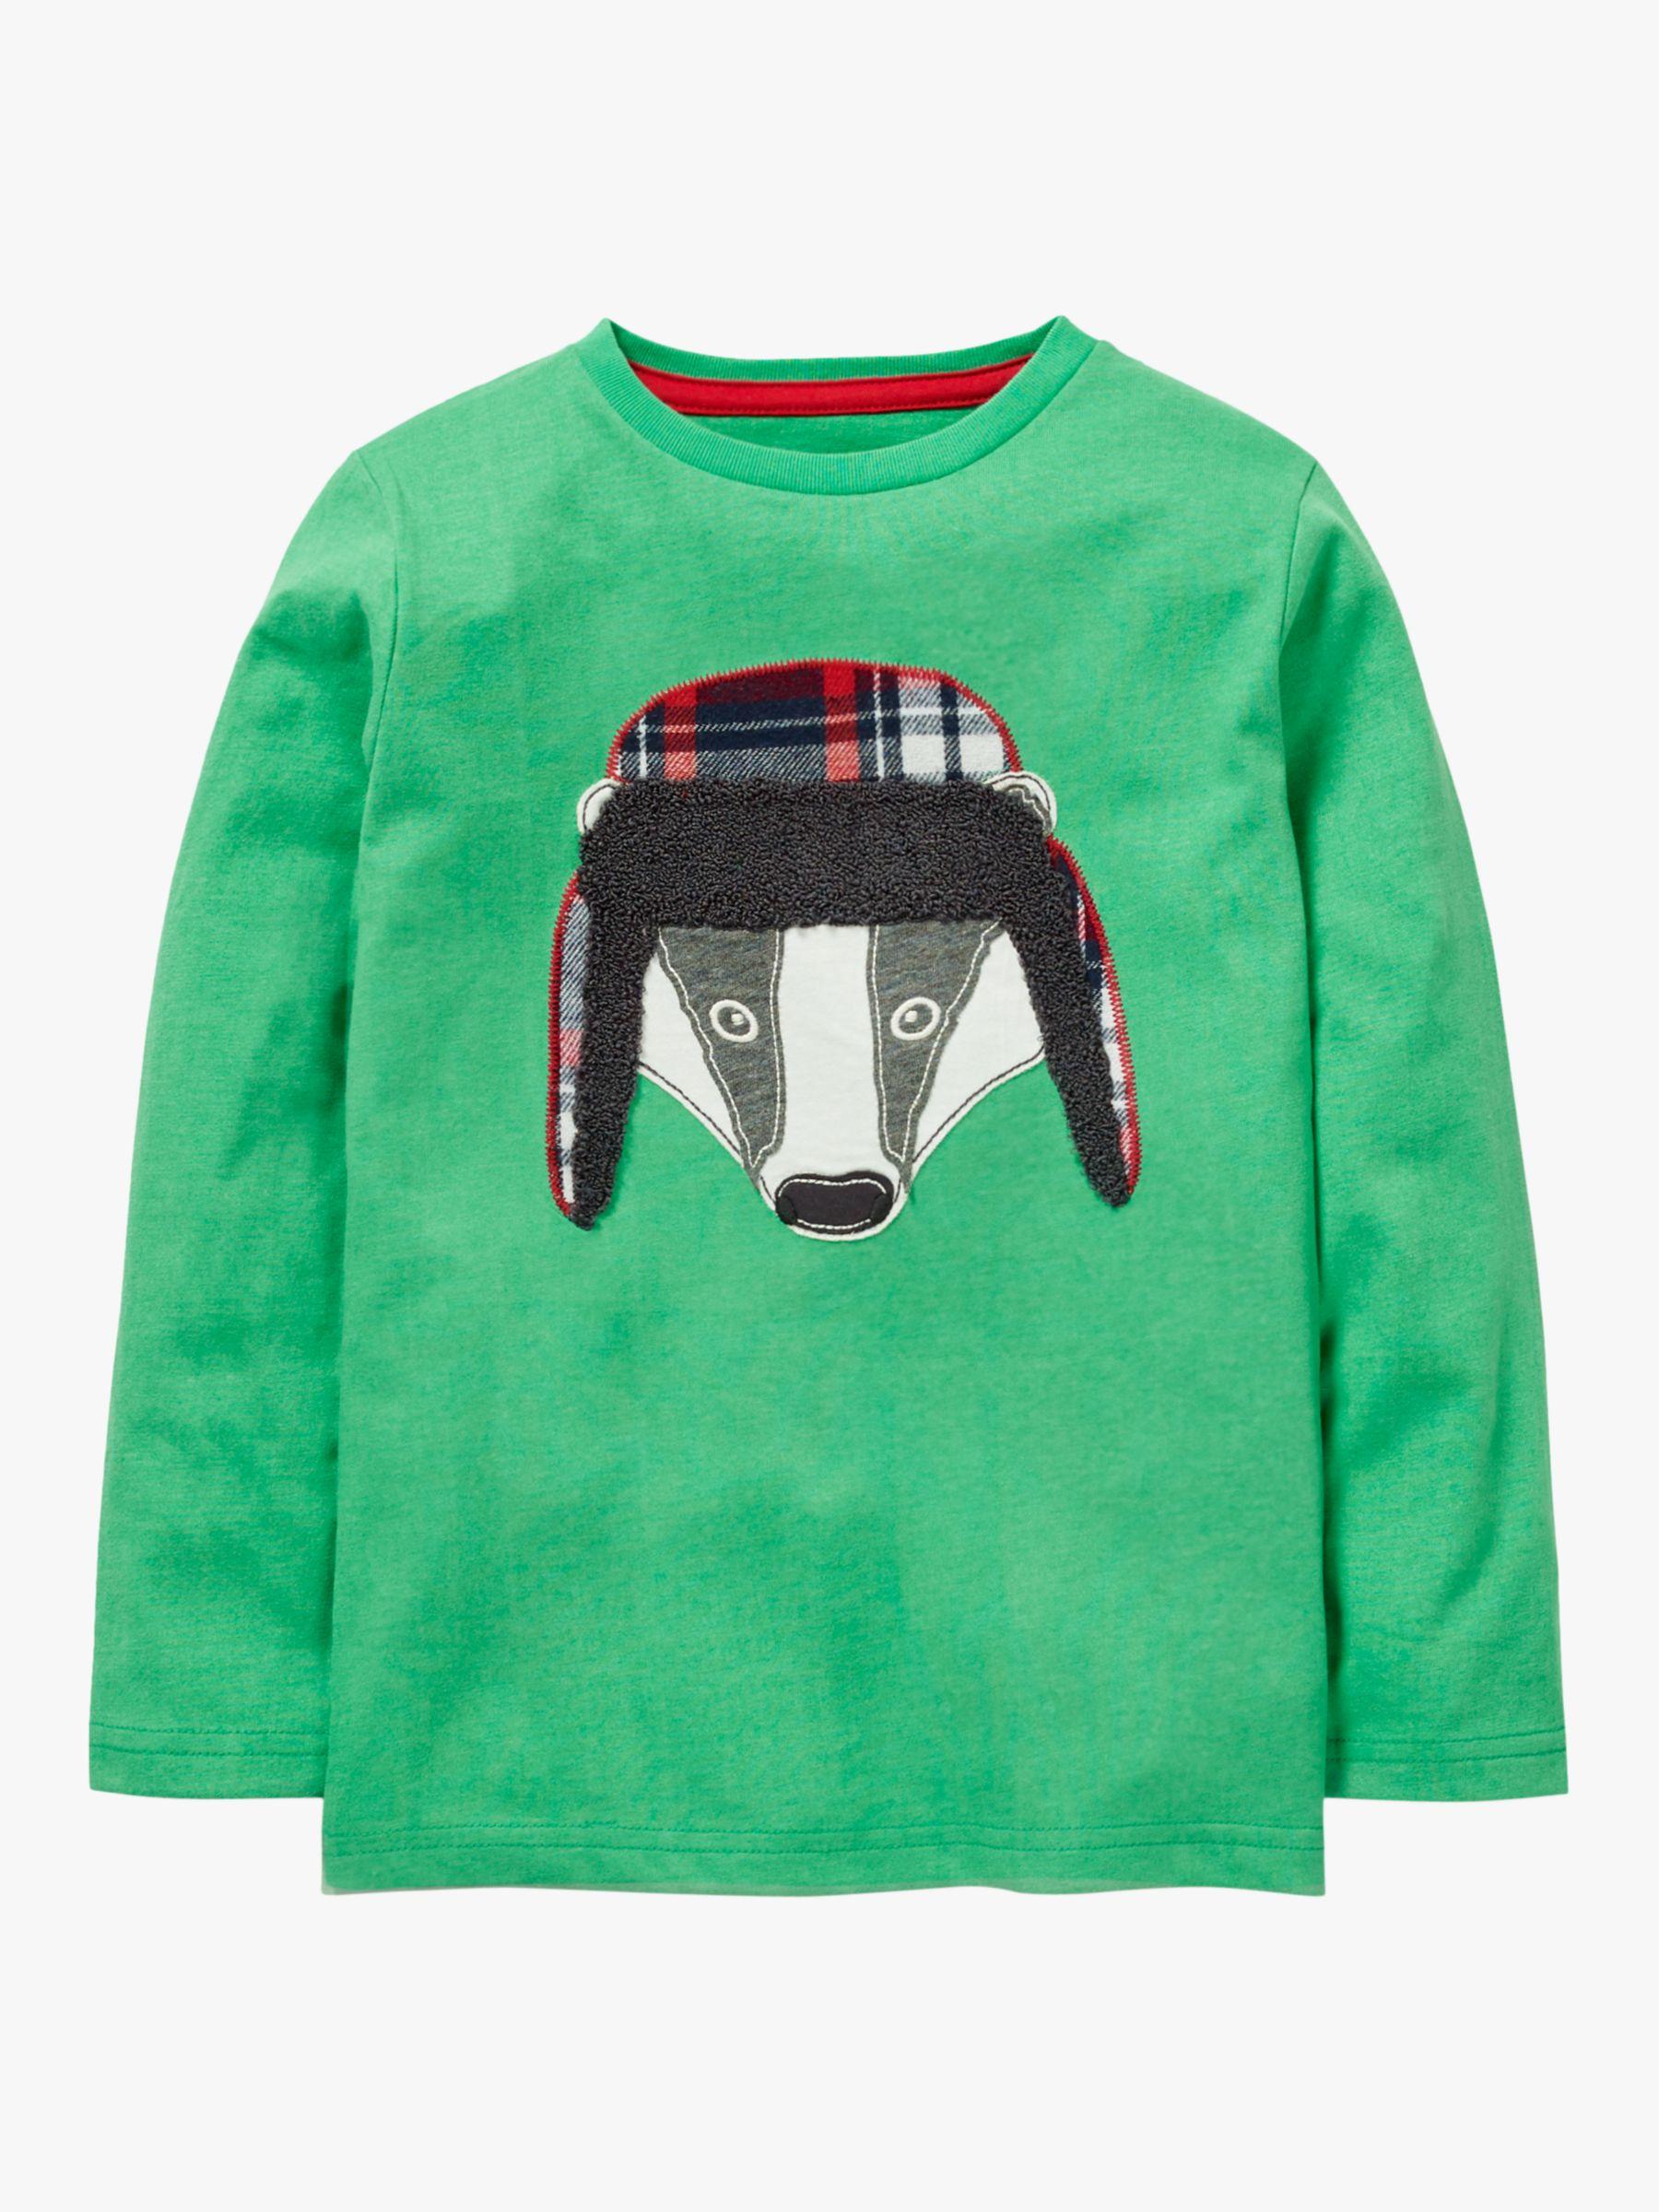 NEW Mini Boden kid boys top tee shirt applique logo adventure animal long sleeve